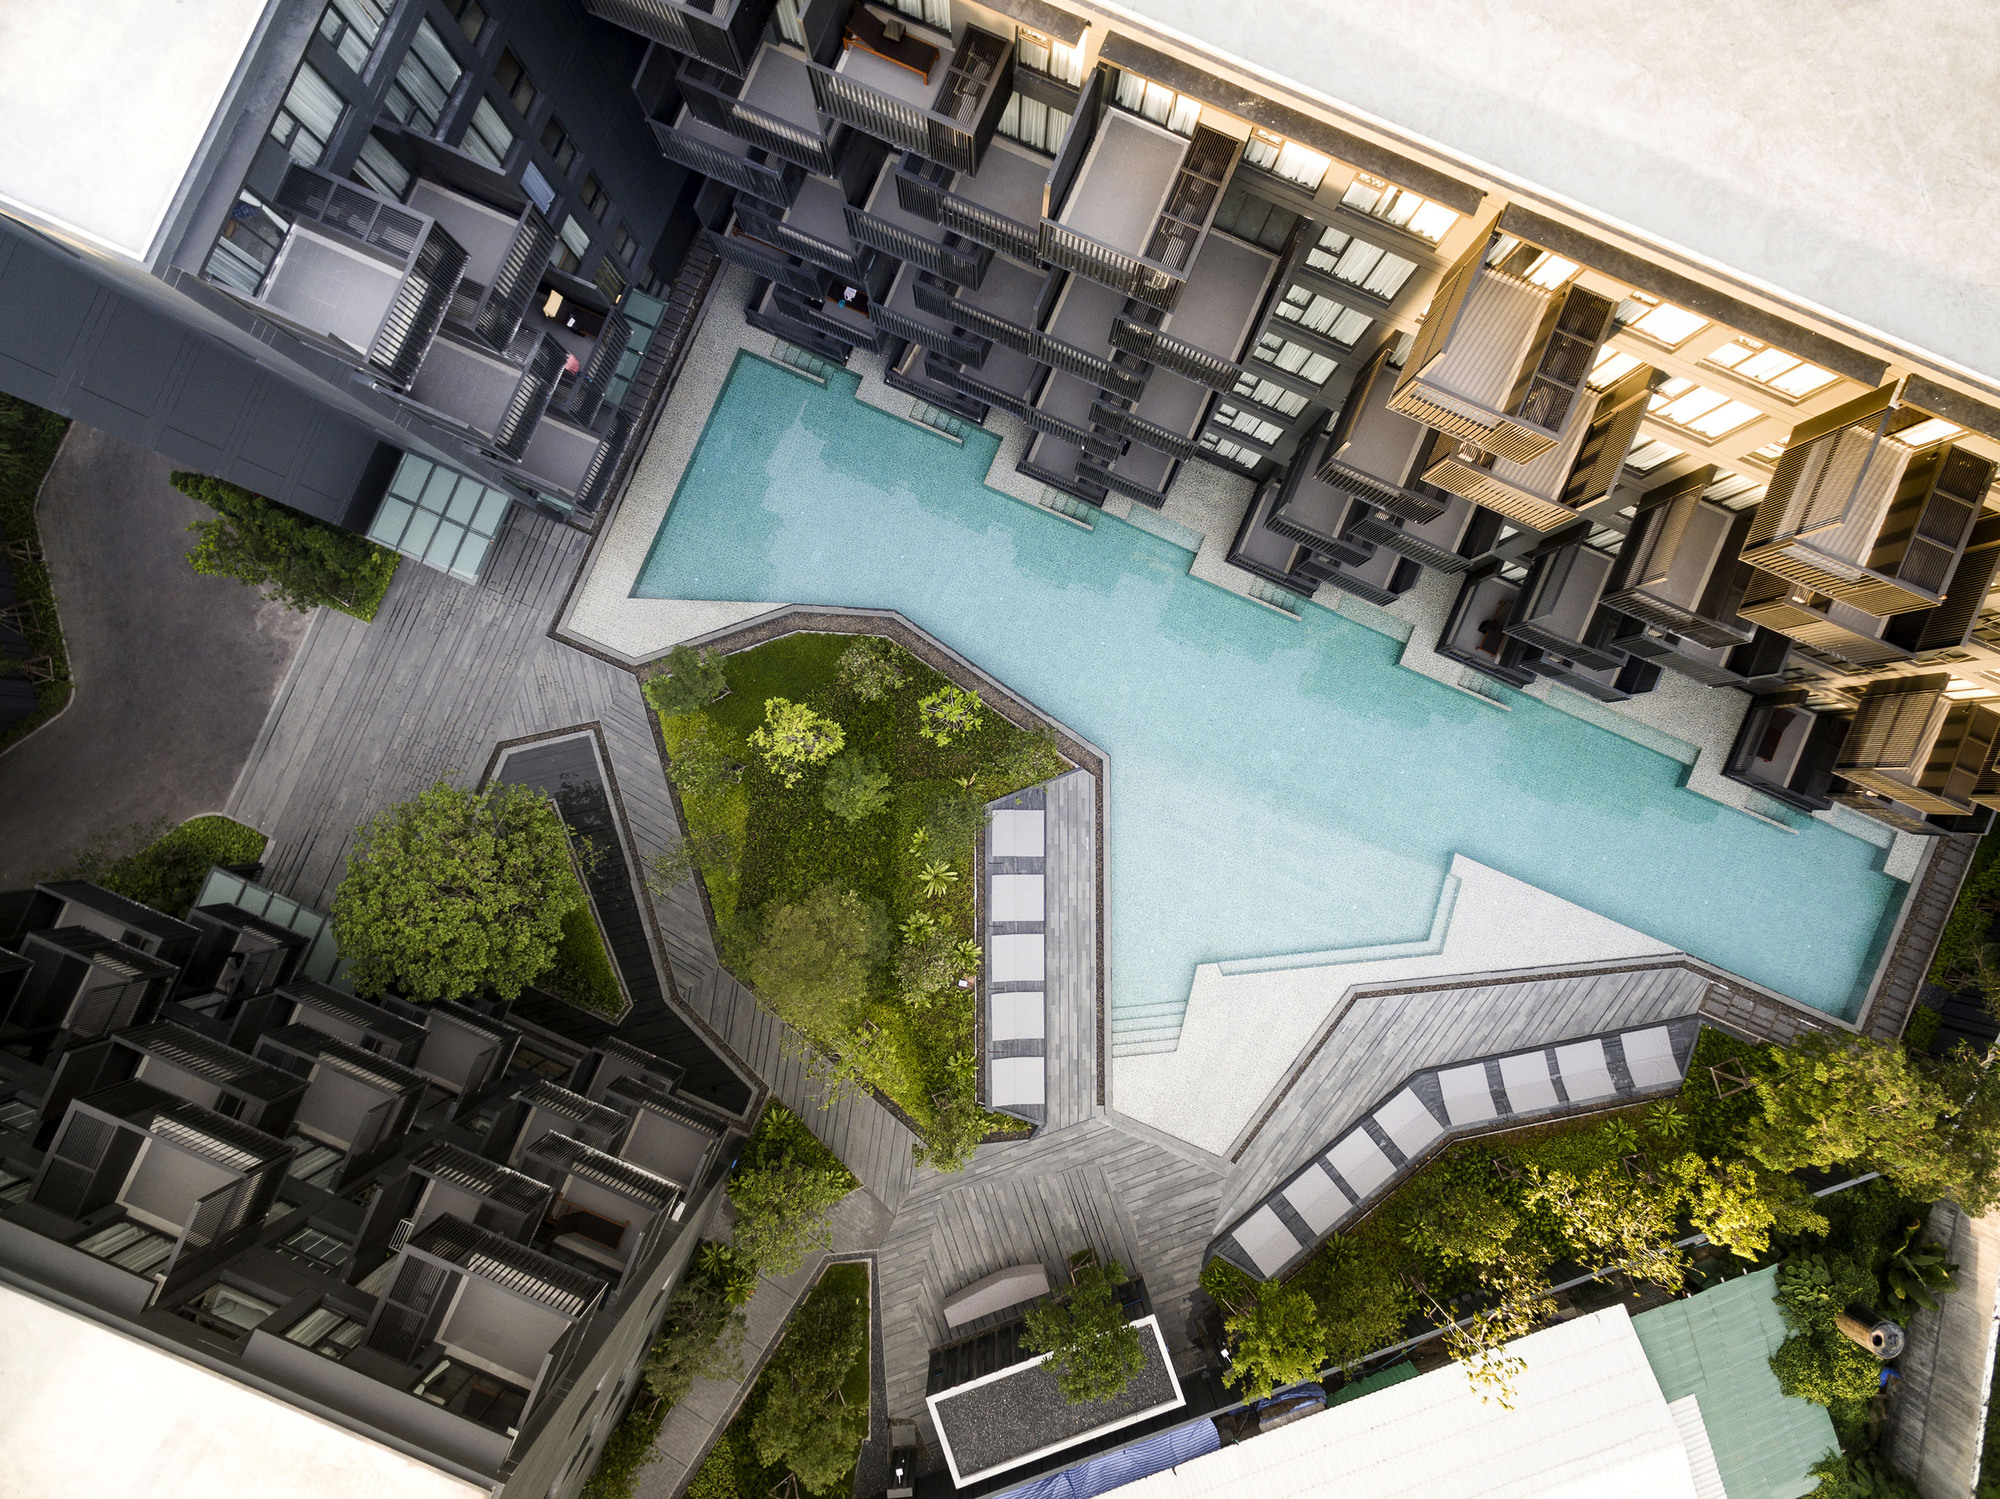 Gallery of the deck somdoon architects 3 for Garden design ideas thailand